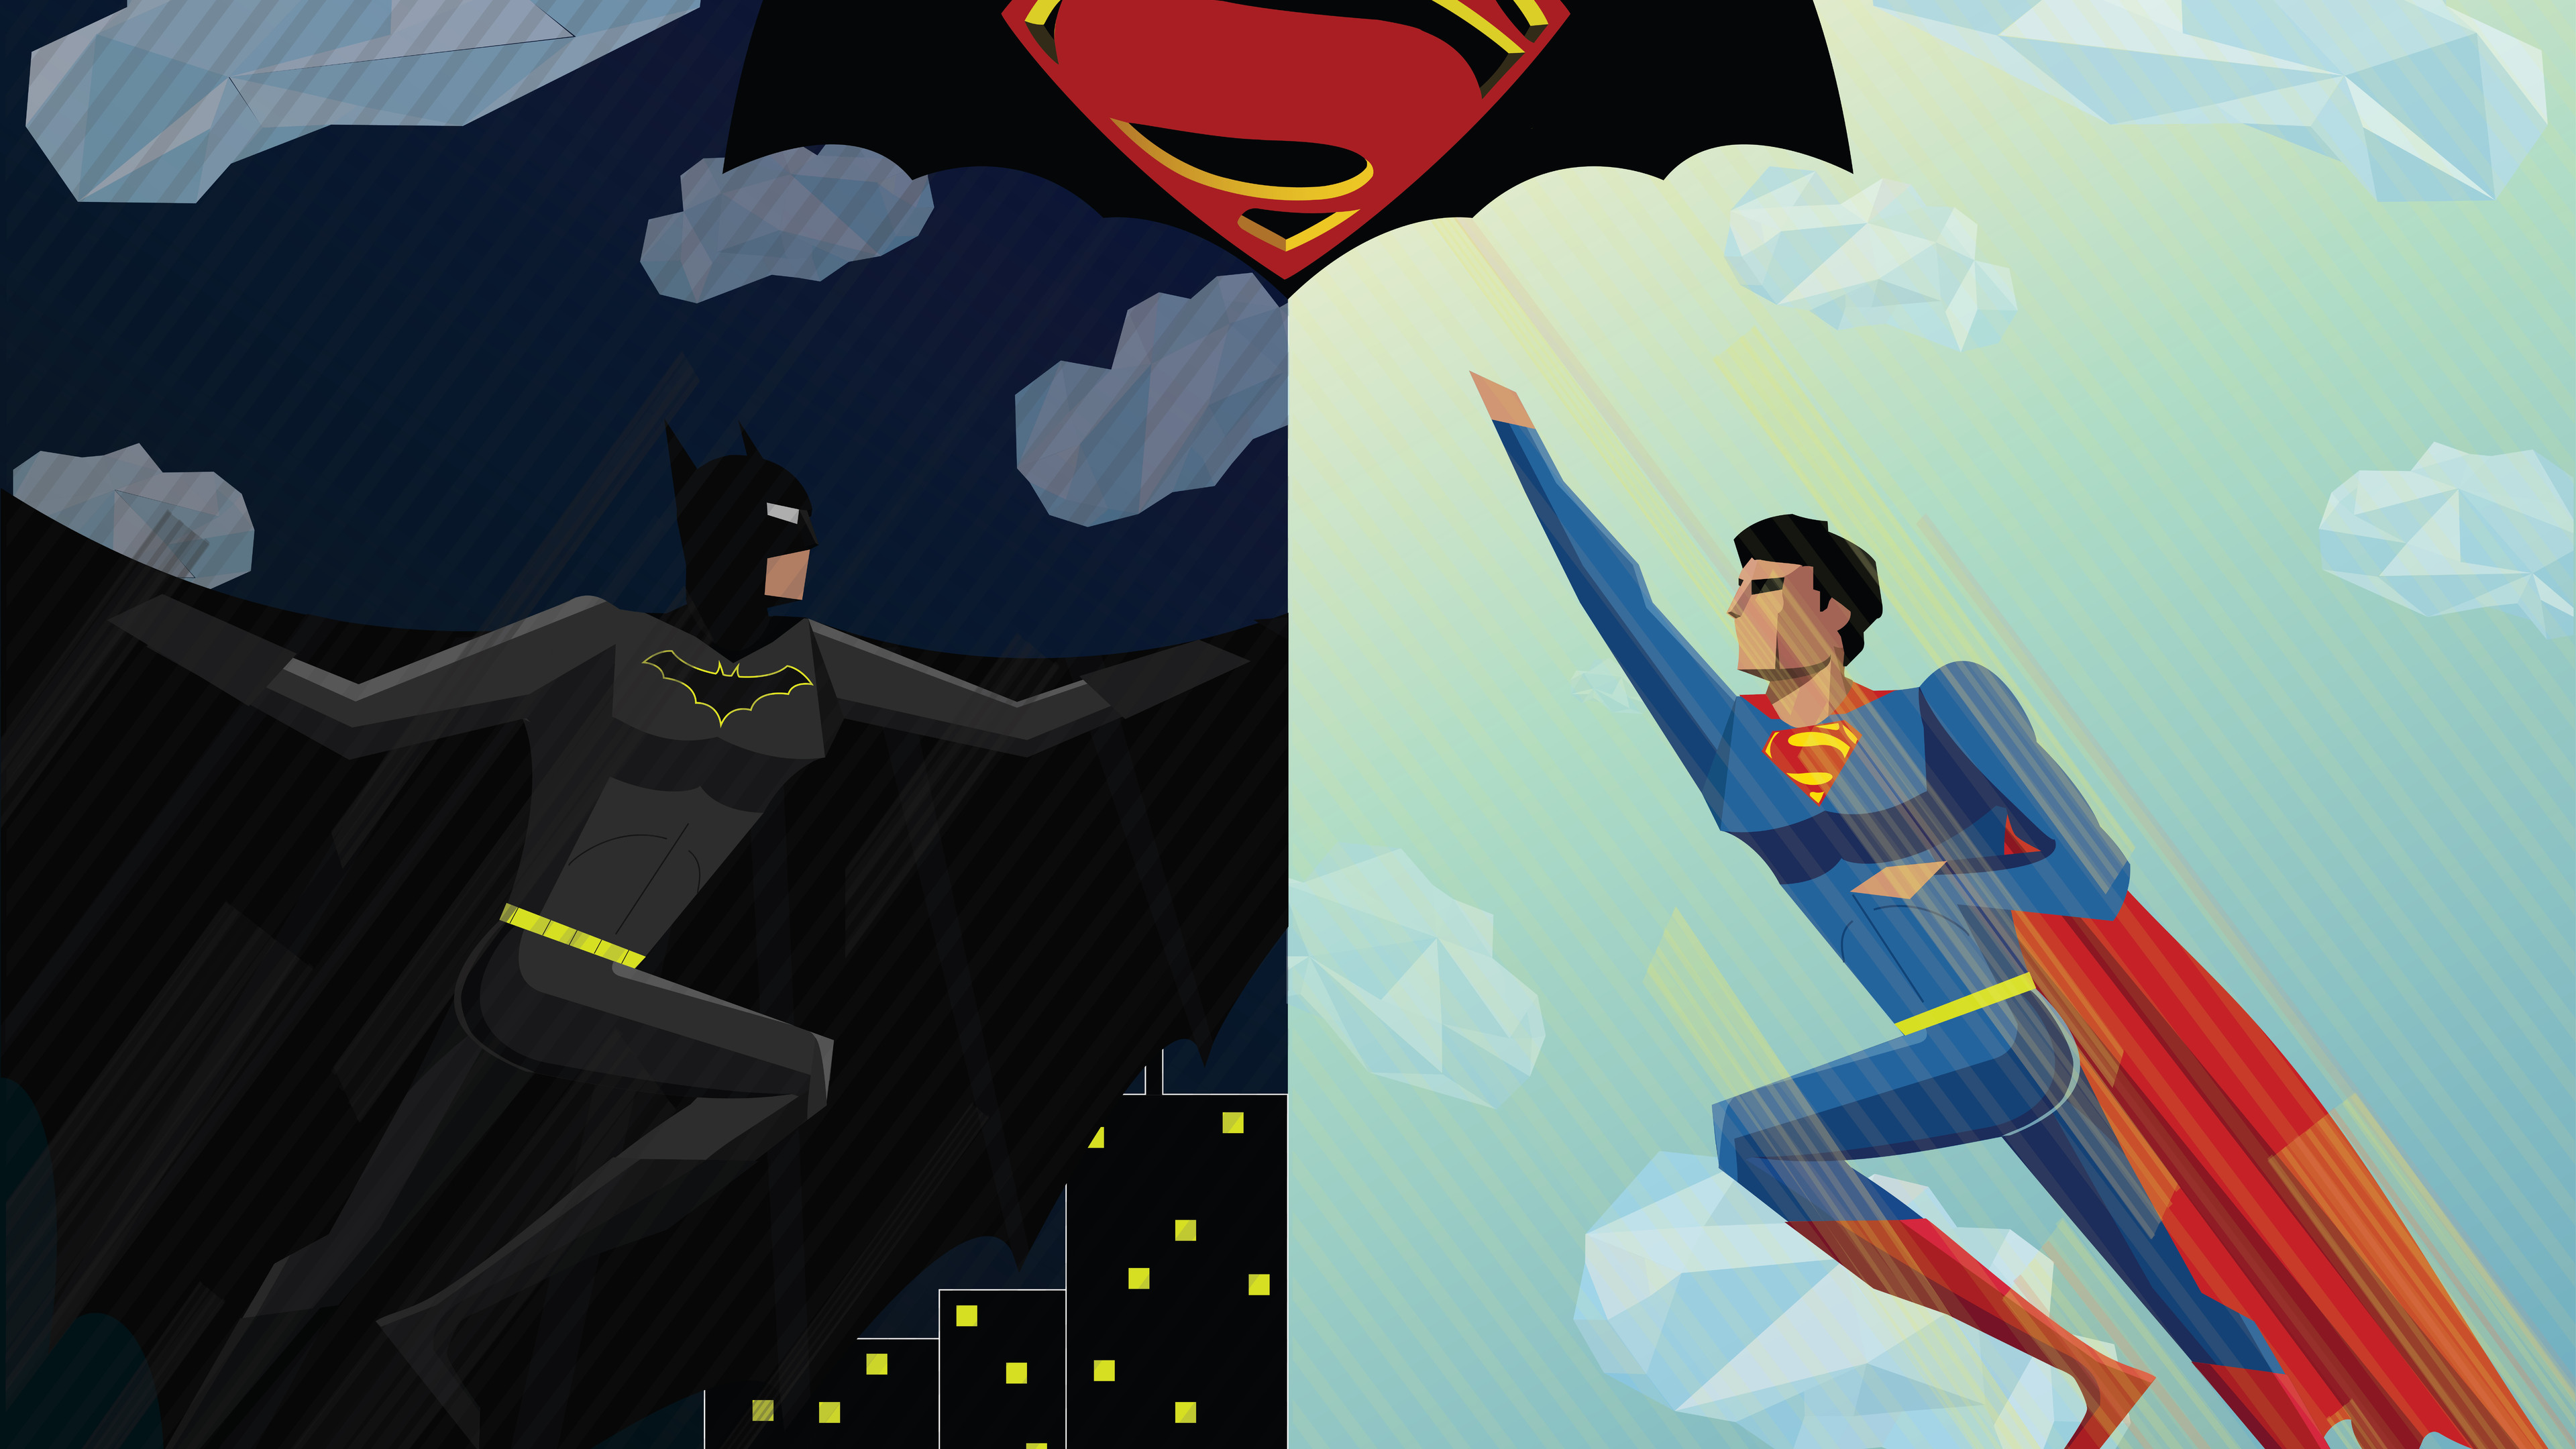 Batman Vs Superman 12k